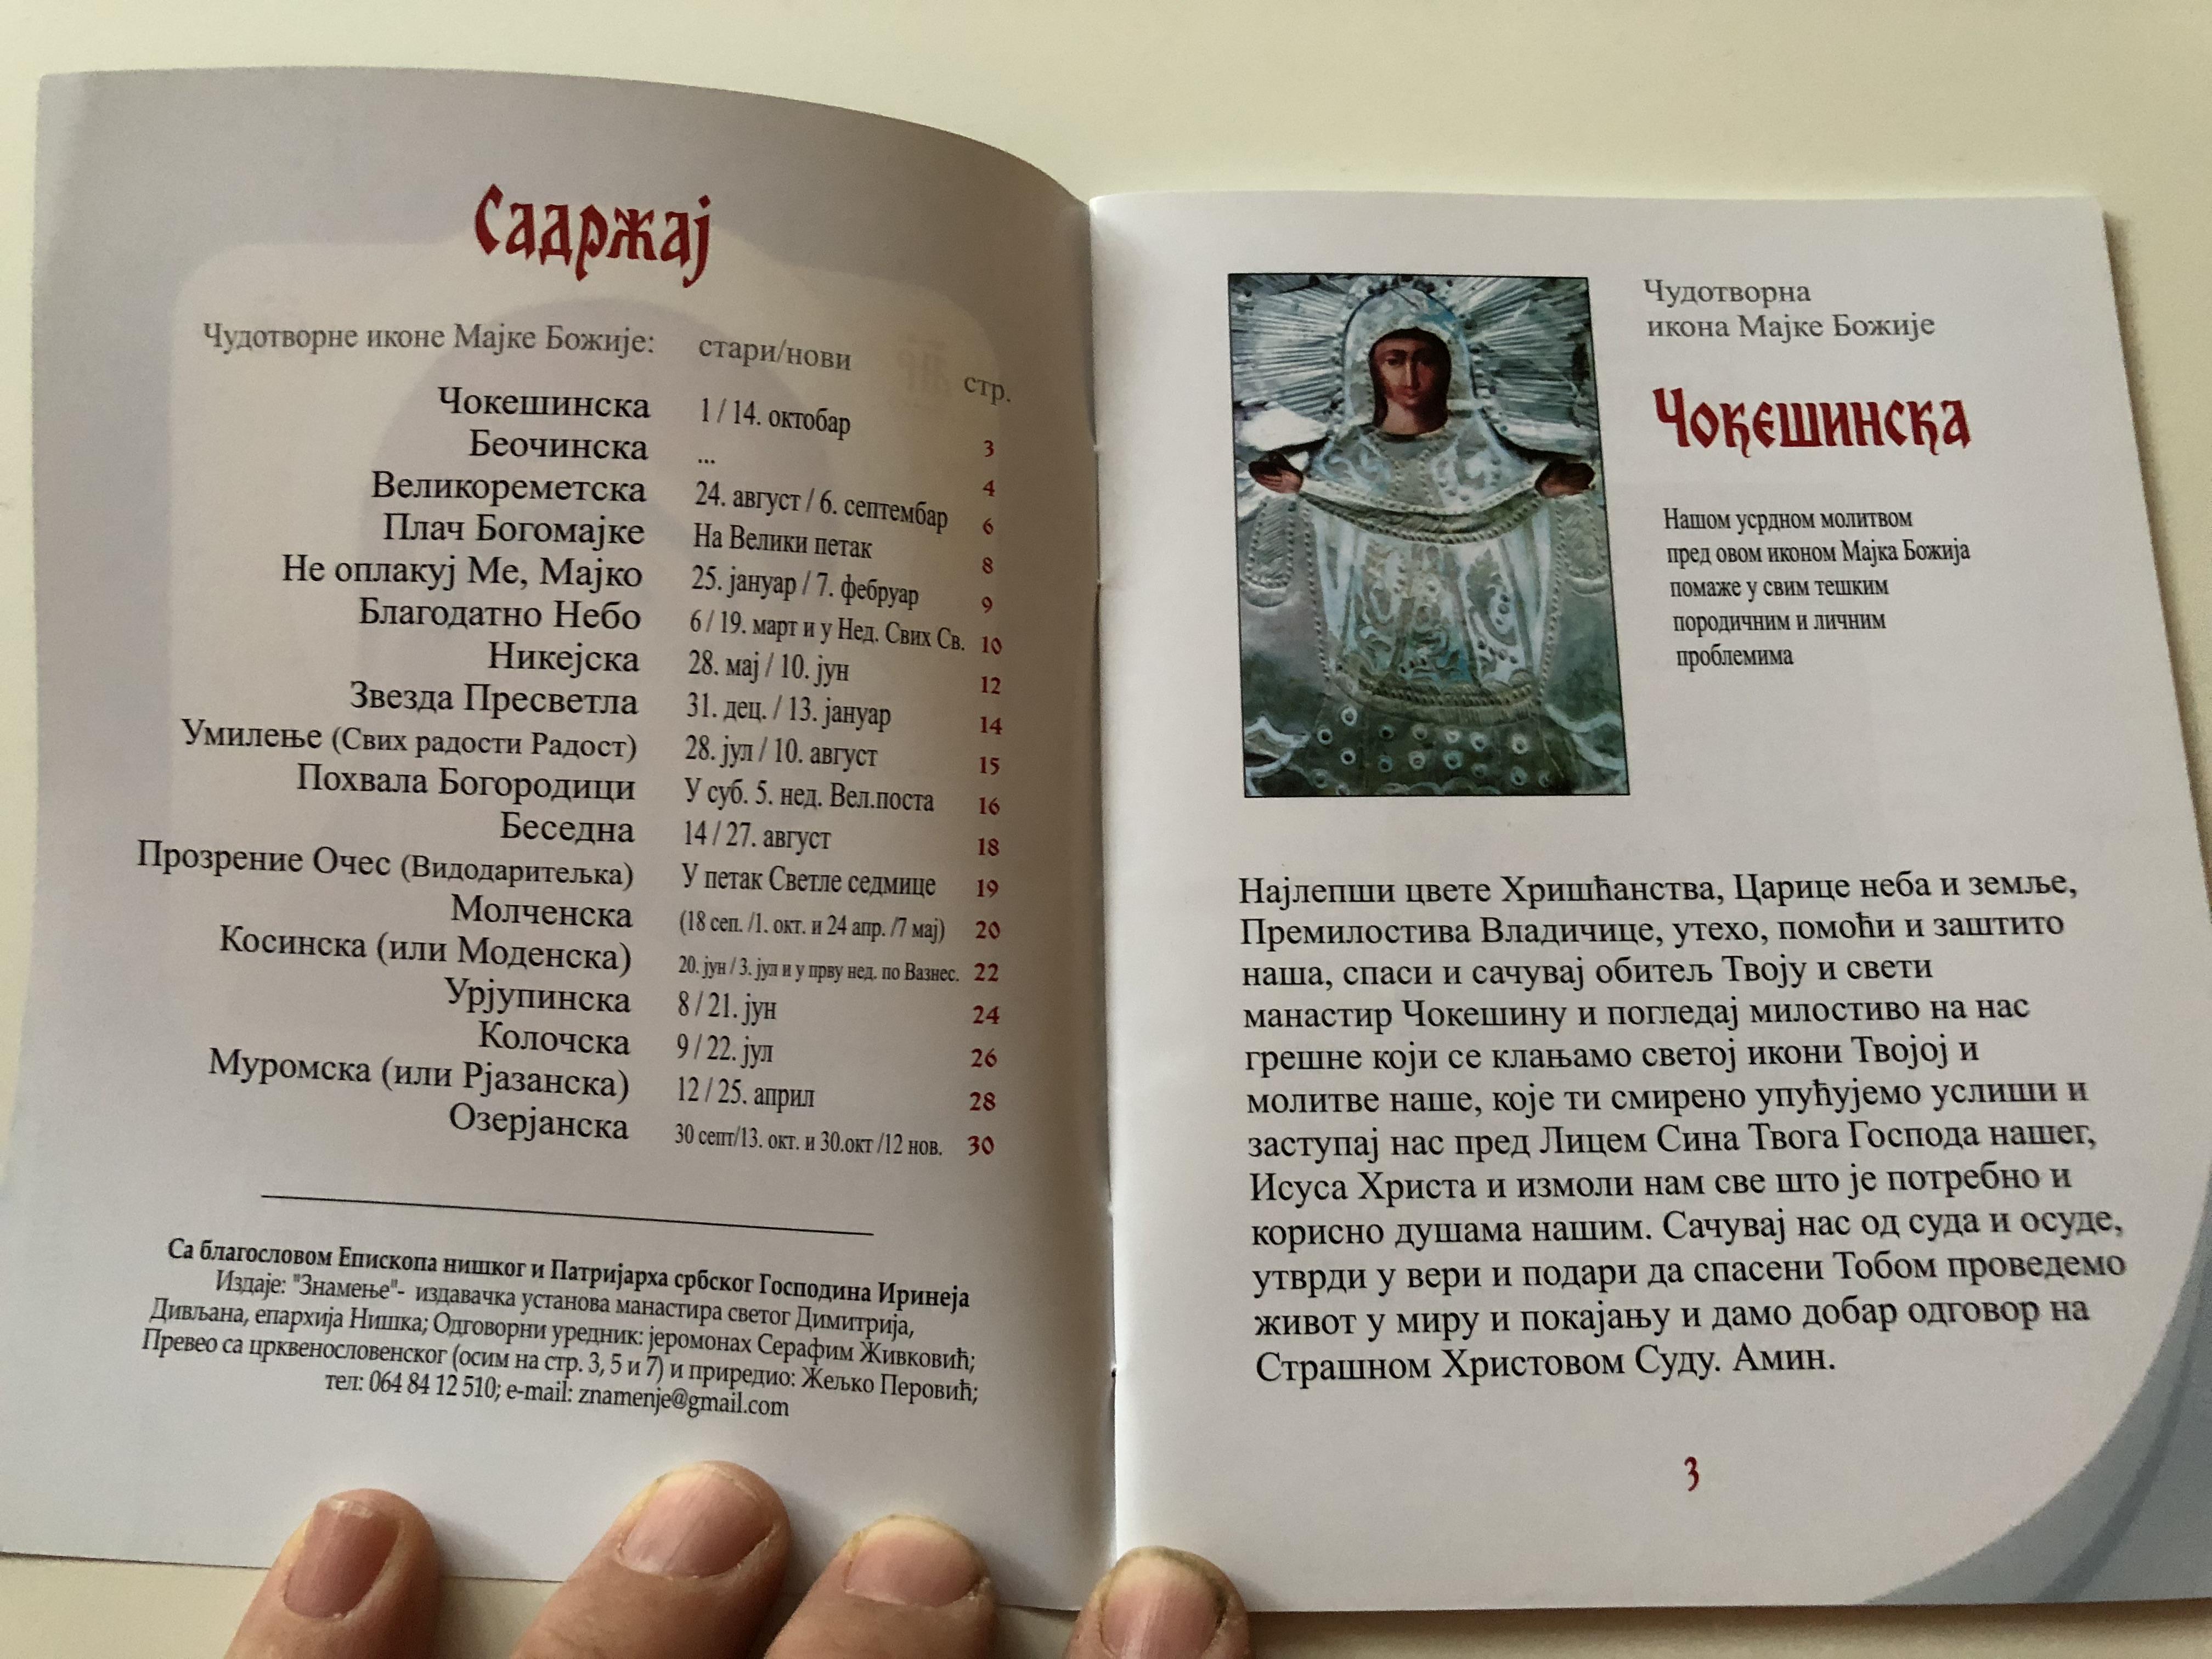 serbian-orthodox-prayer-booklet-blue-4-2-.jpg